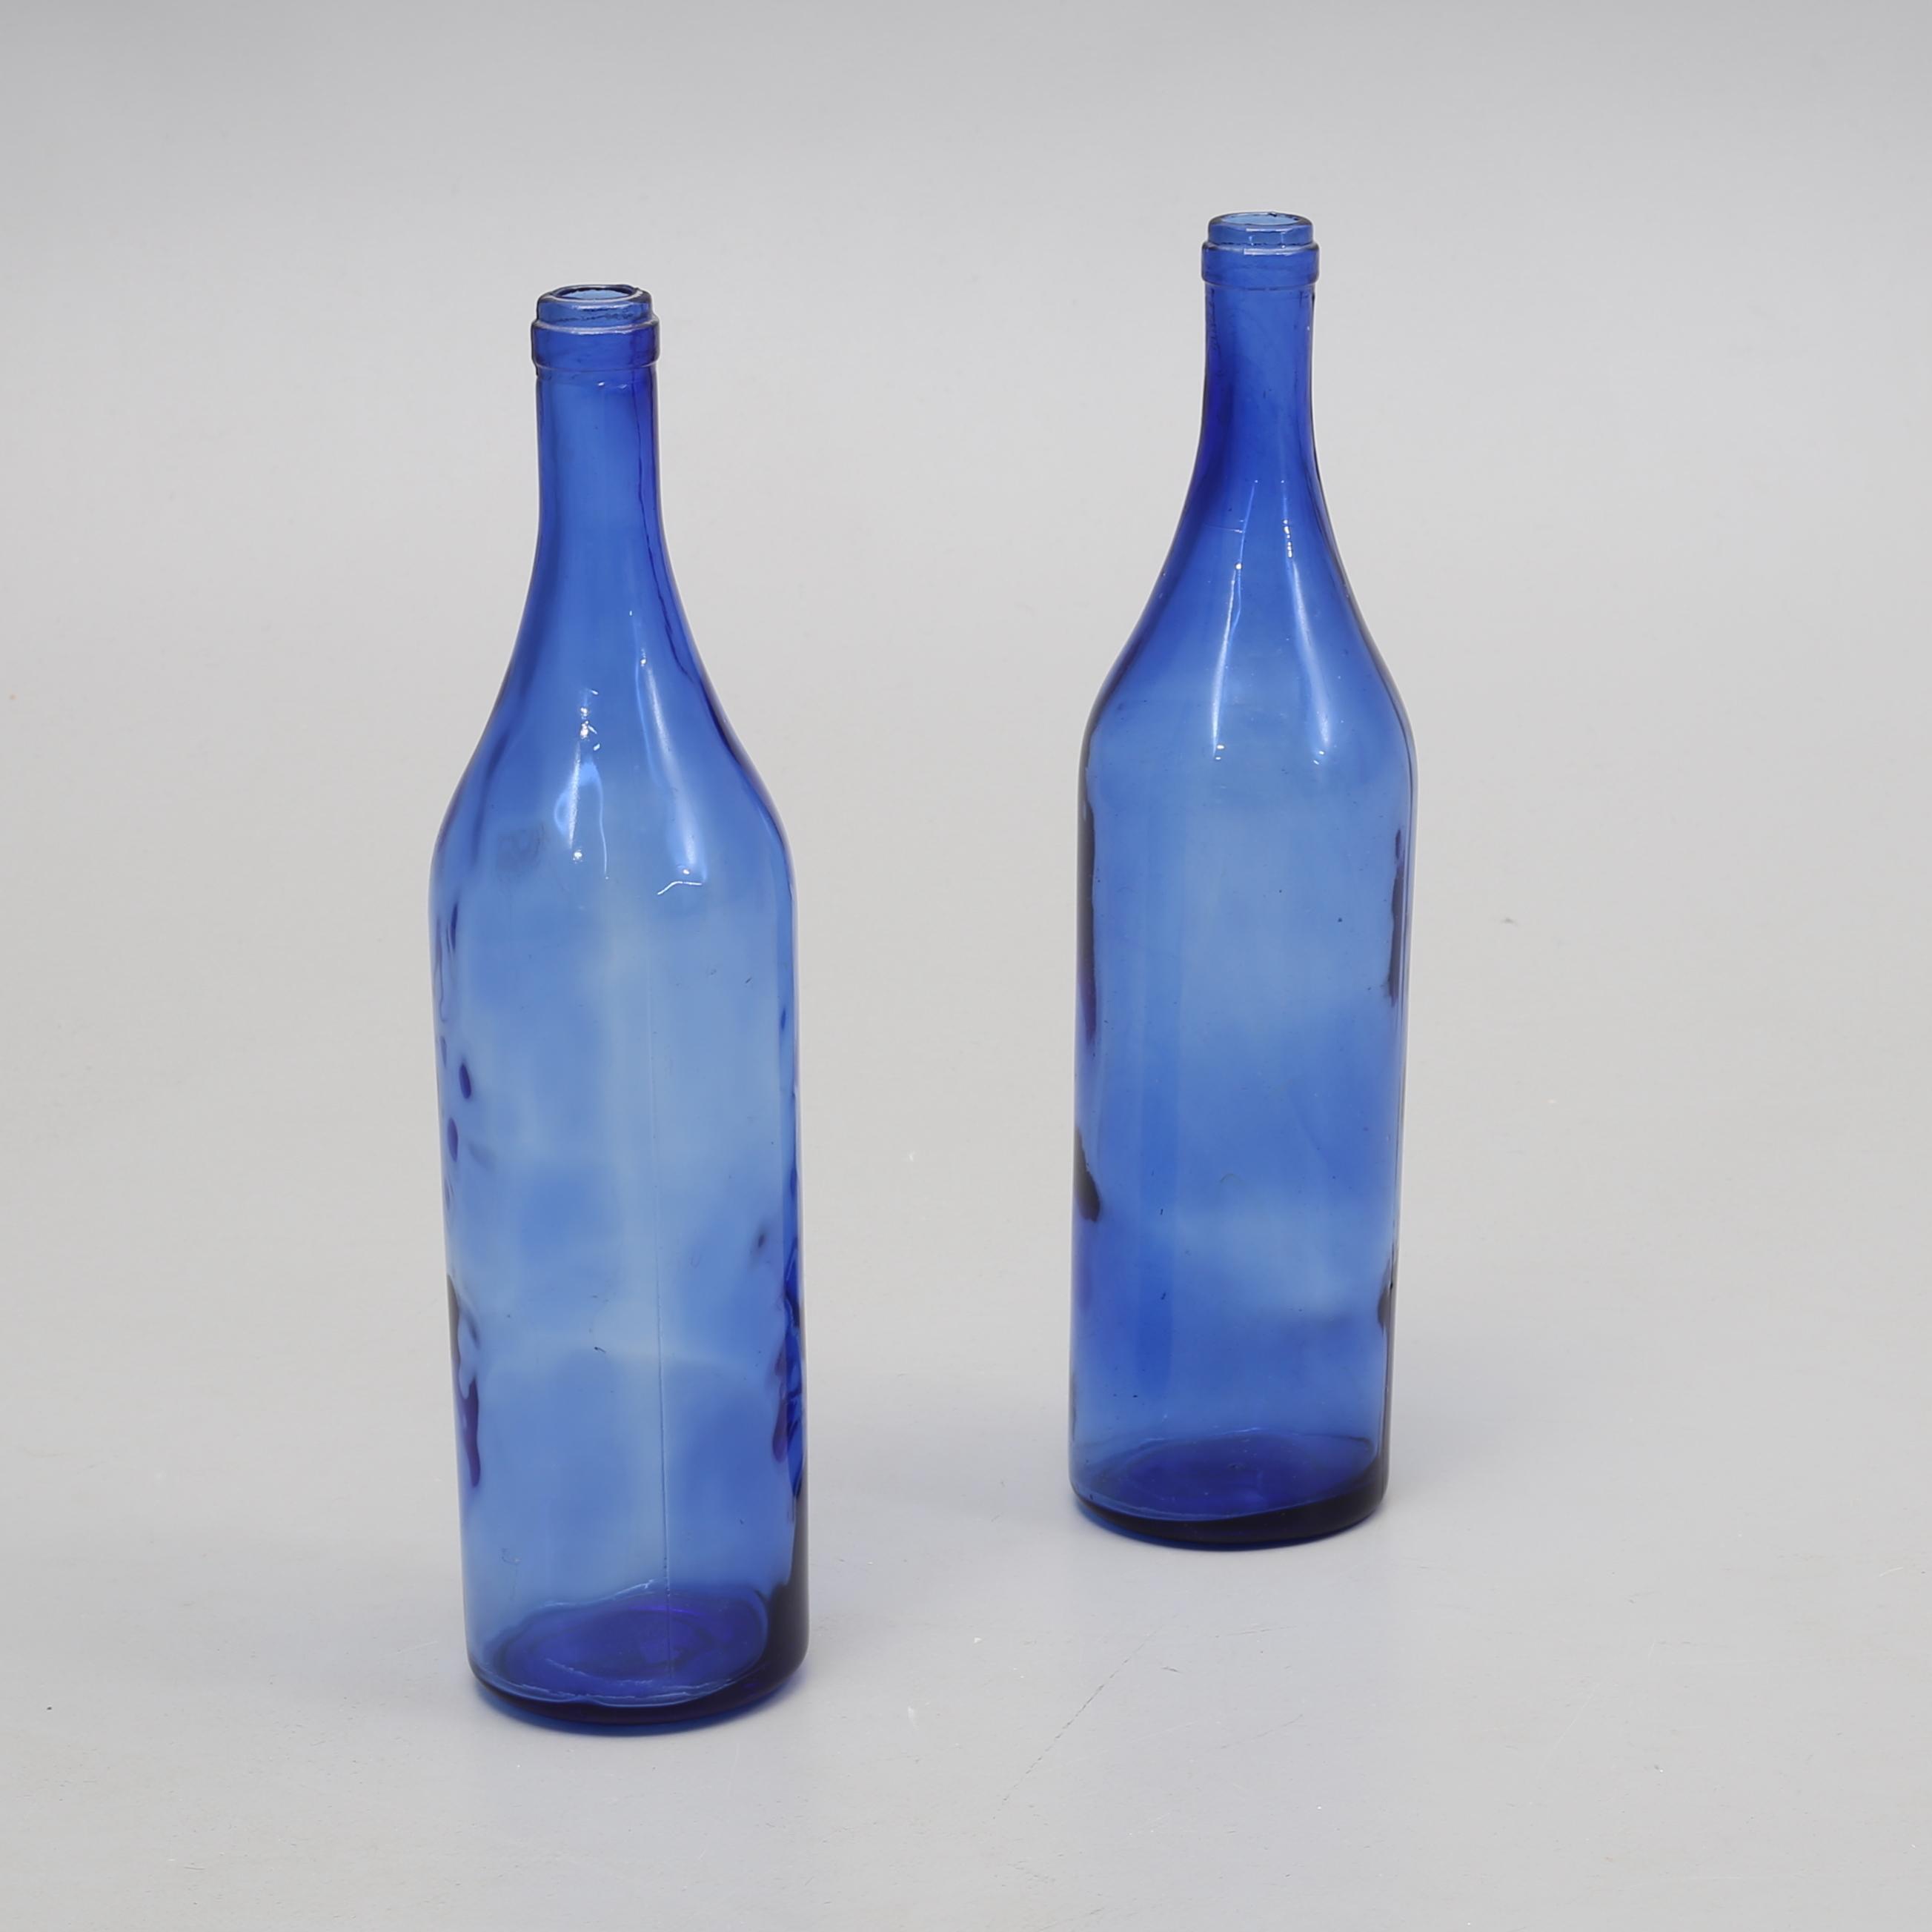 panta danska flaskor